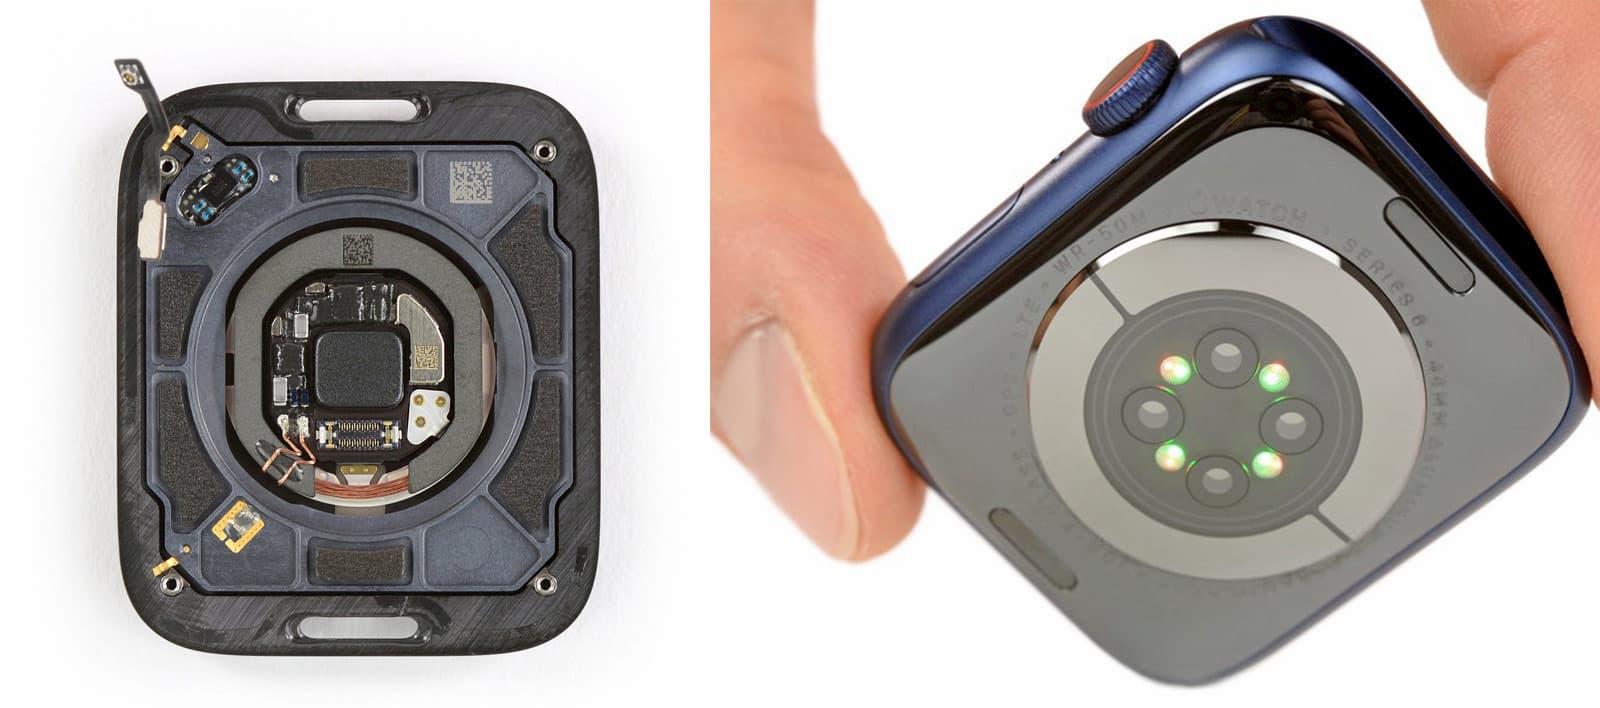 Apple Watch Series 6 拆解報告出爐:電池更大、內部明顯改進7